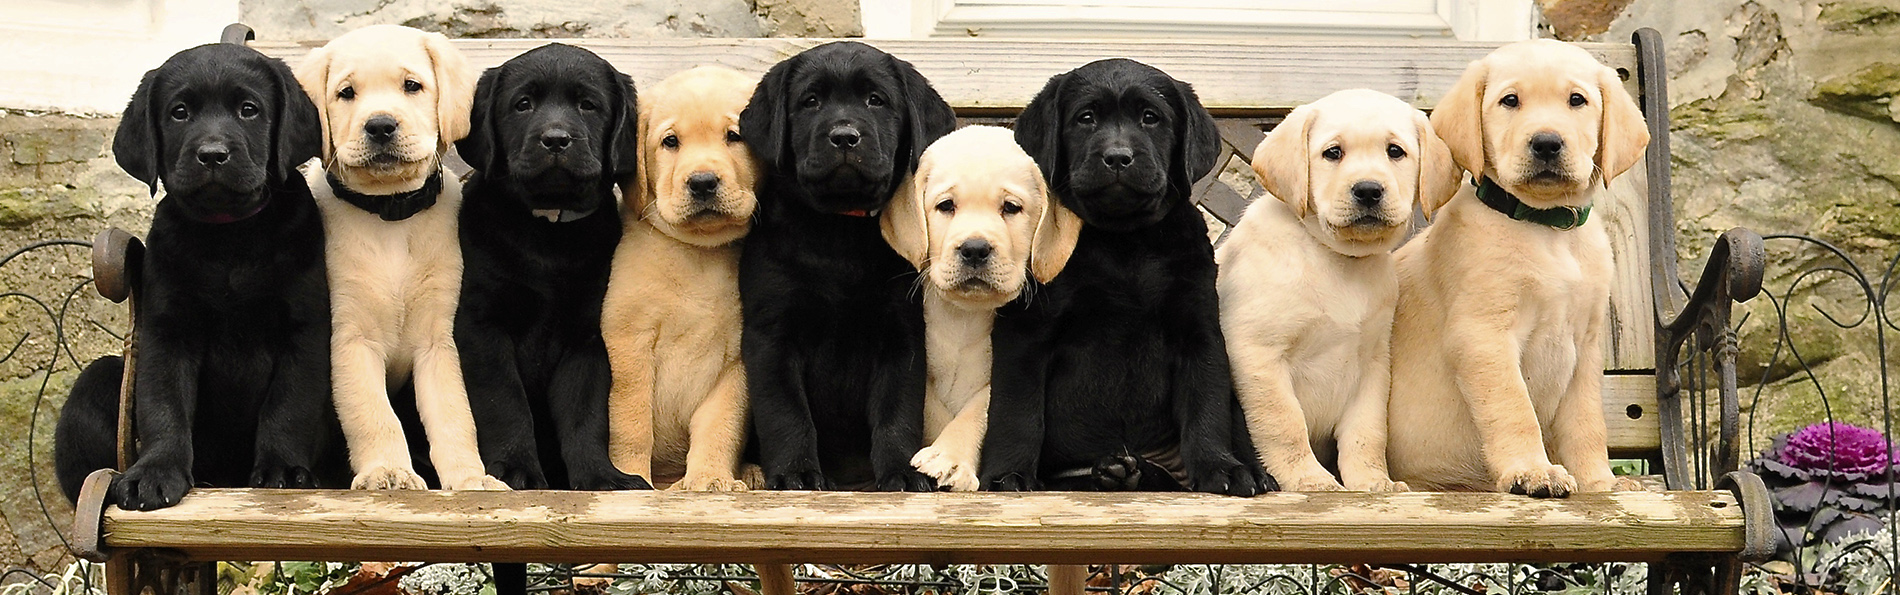 A tiny black lab puppy